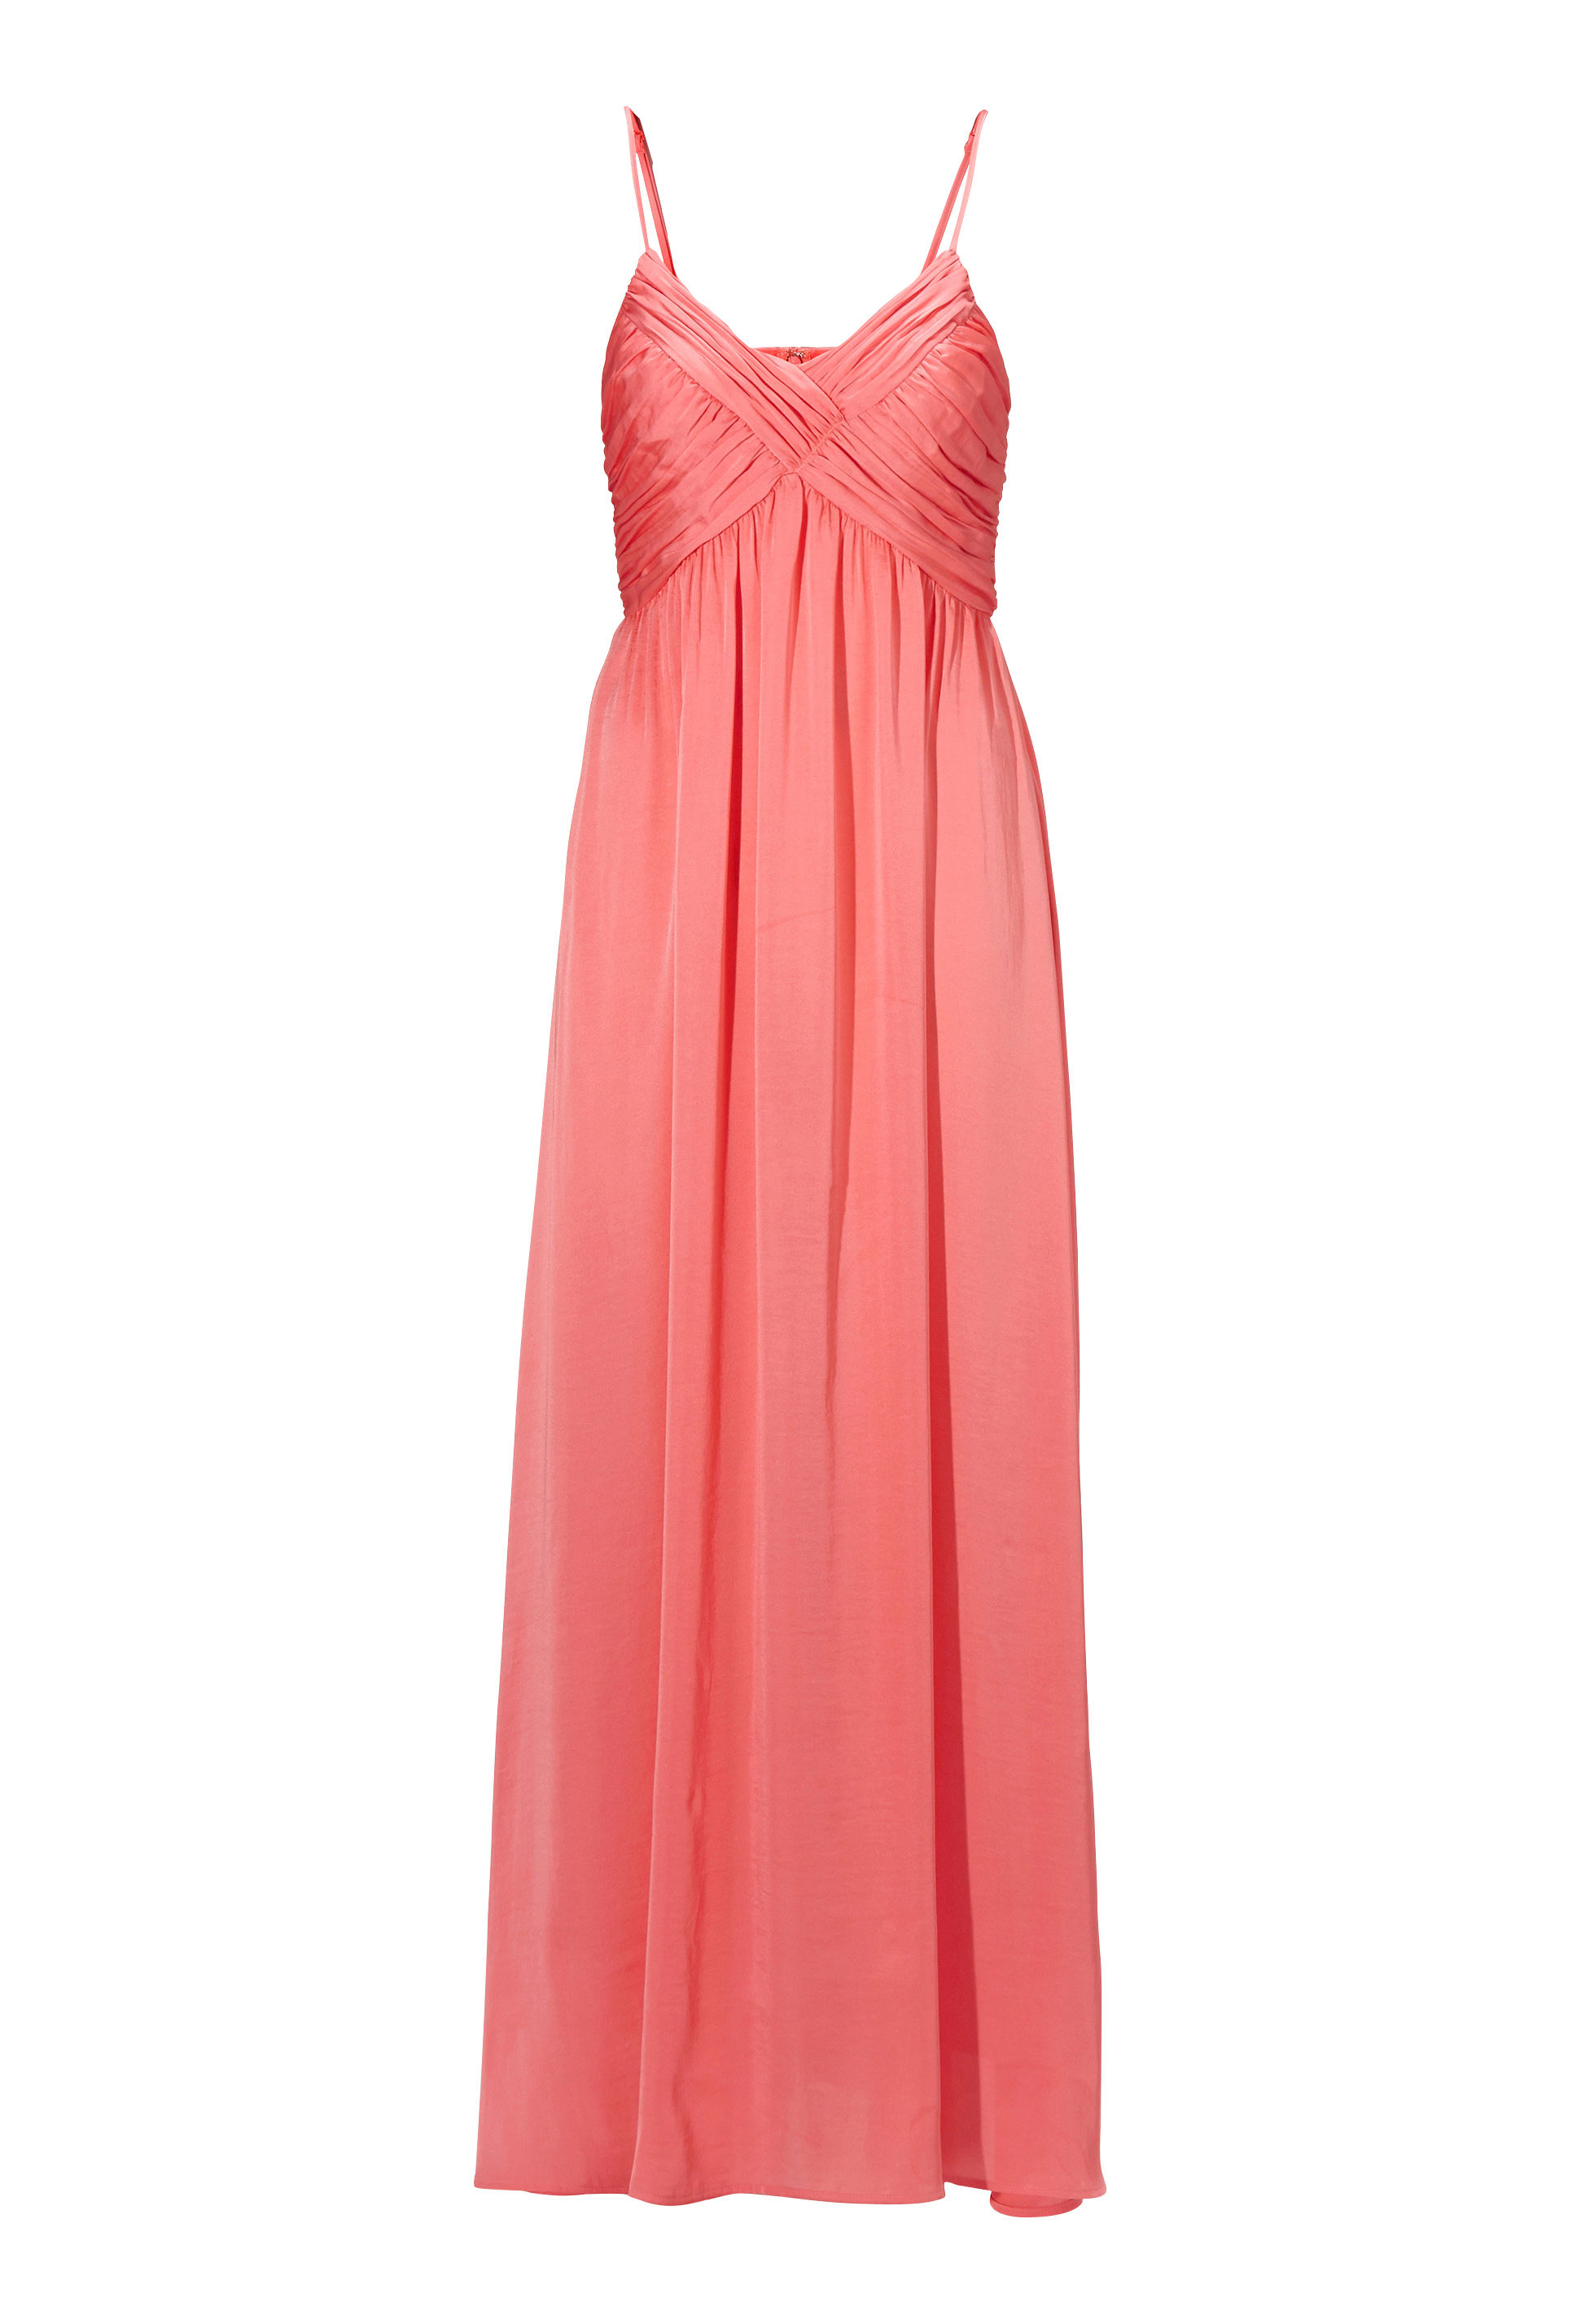 be6fbf43e8da Make Way Aimee Dress Coral - Bubbleroom